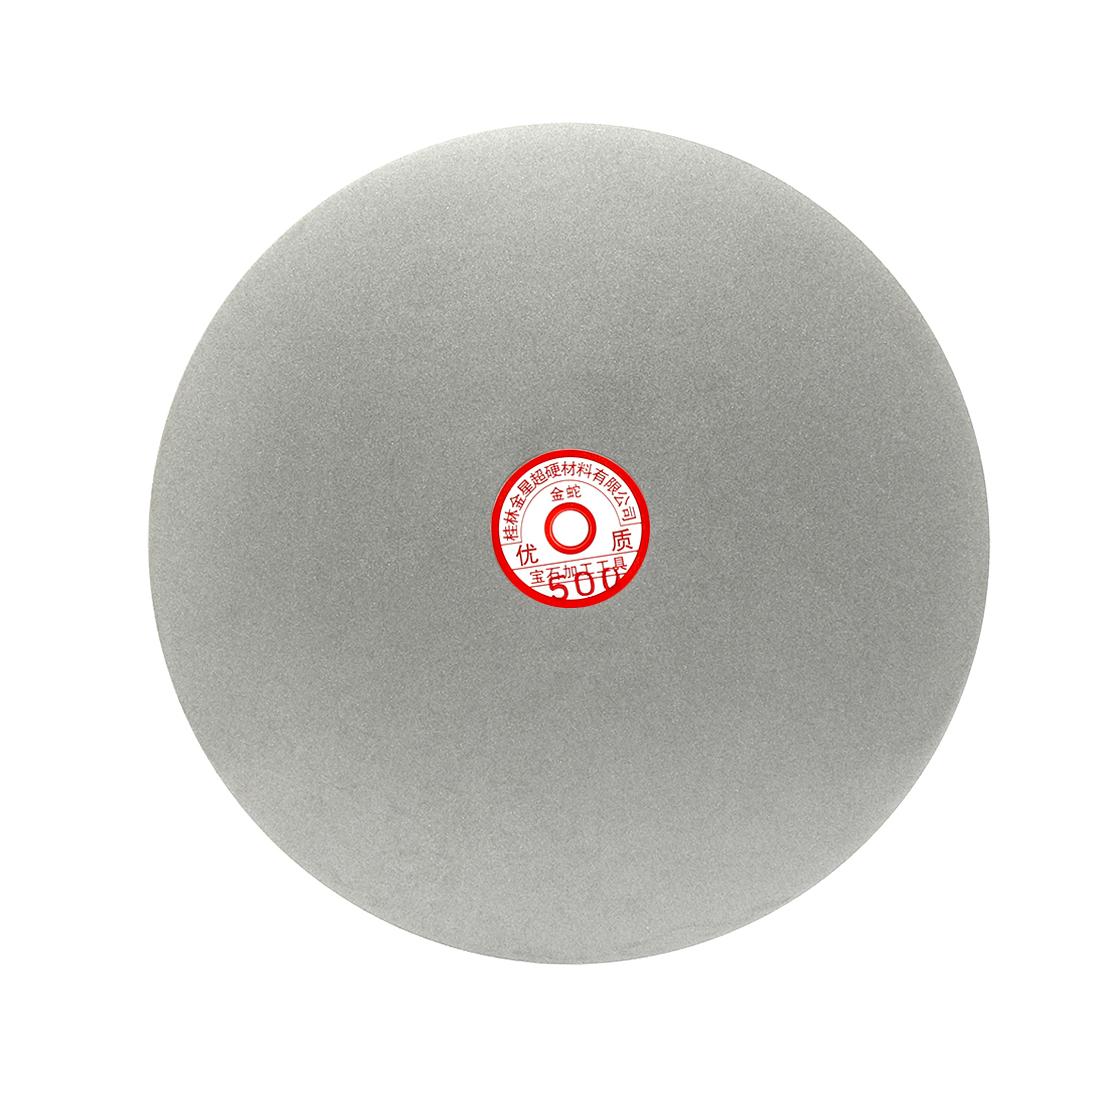 300mm 12-inch Grit 500 Diamond Coated Flat Lap Disk Wheel Grinding Sanding Disc